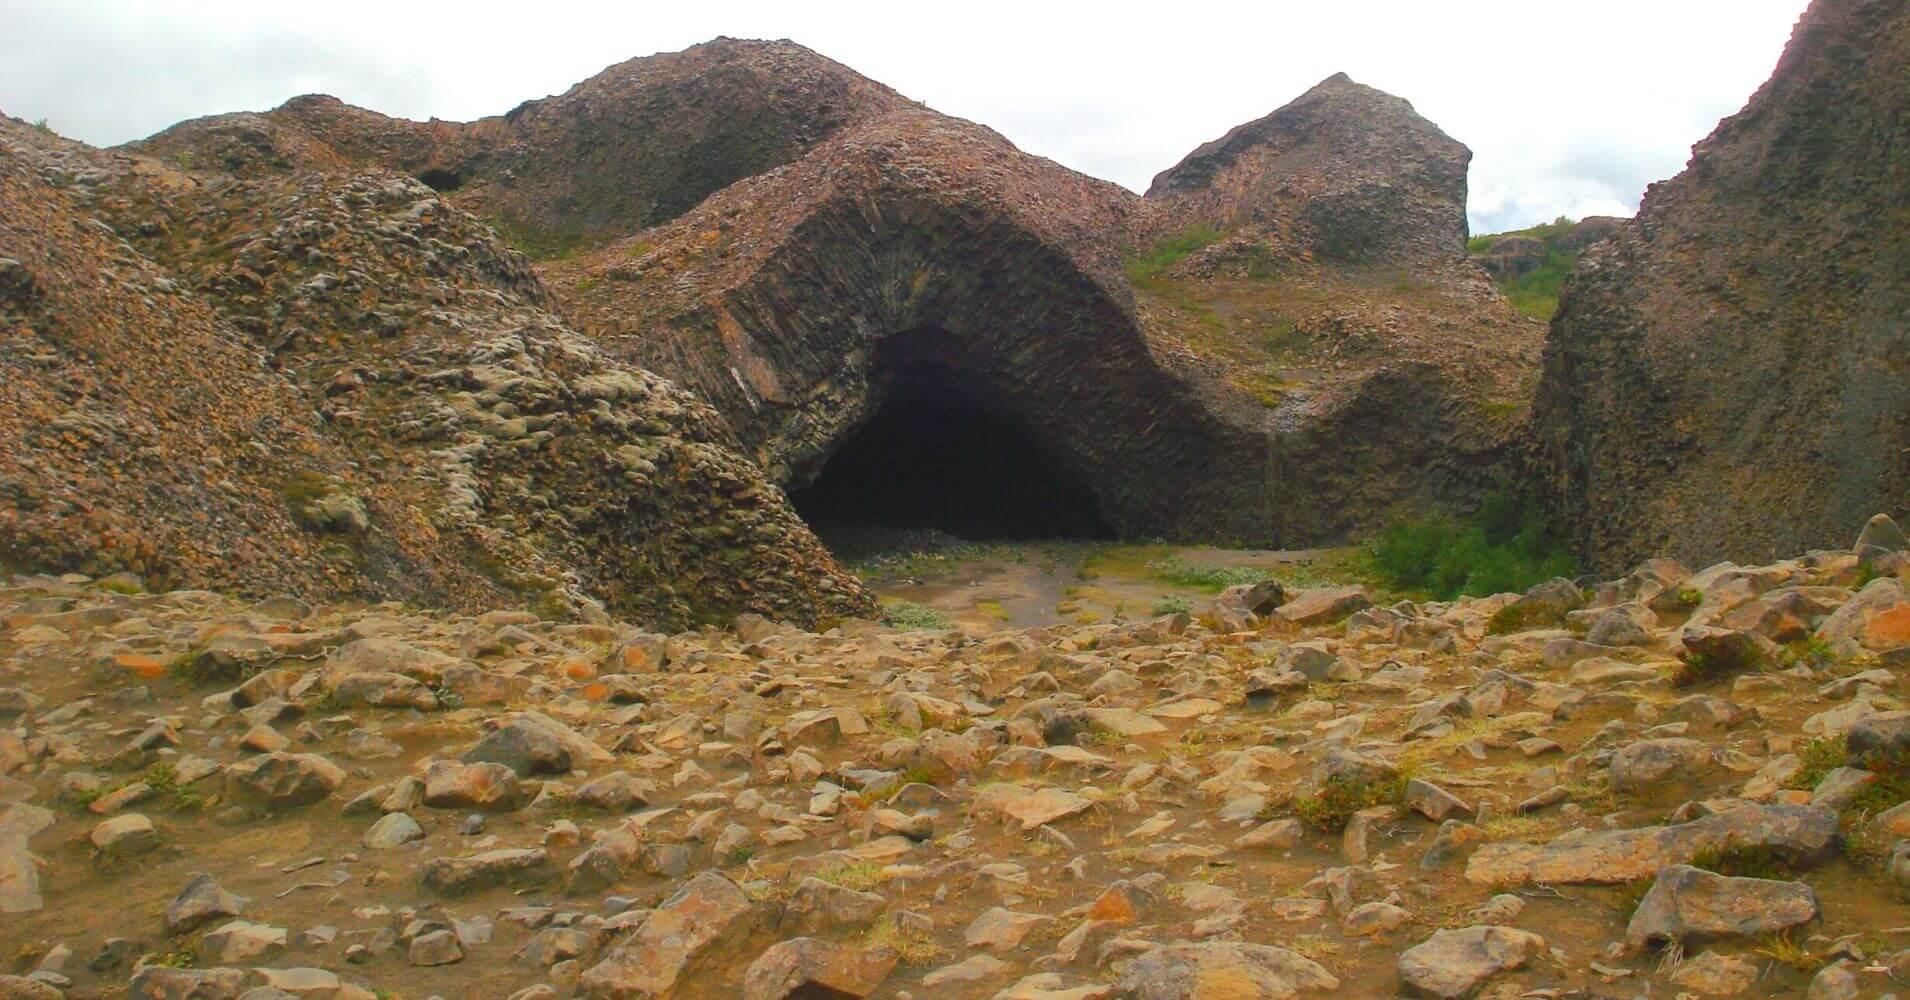 Cuevas Hljodarklettar. Jökulsárgljúfur. Islandia.